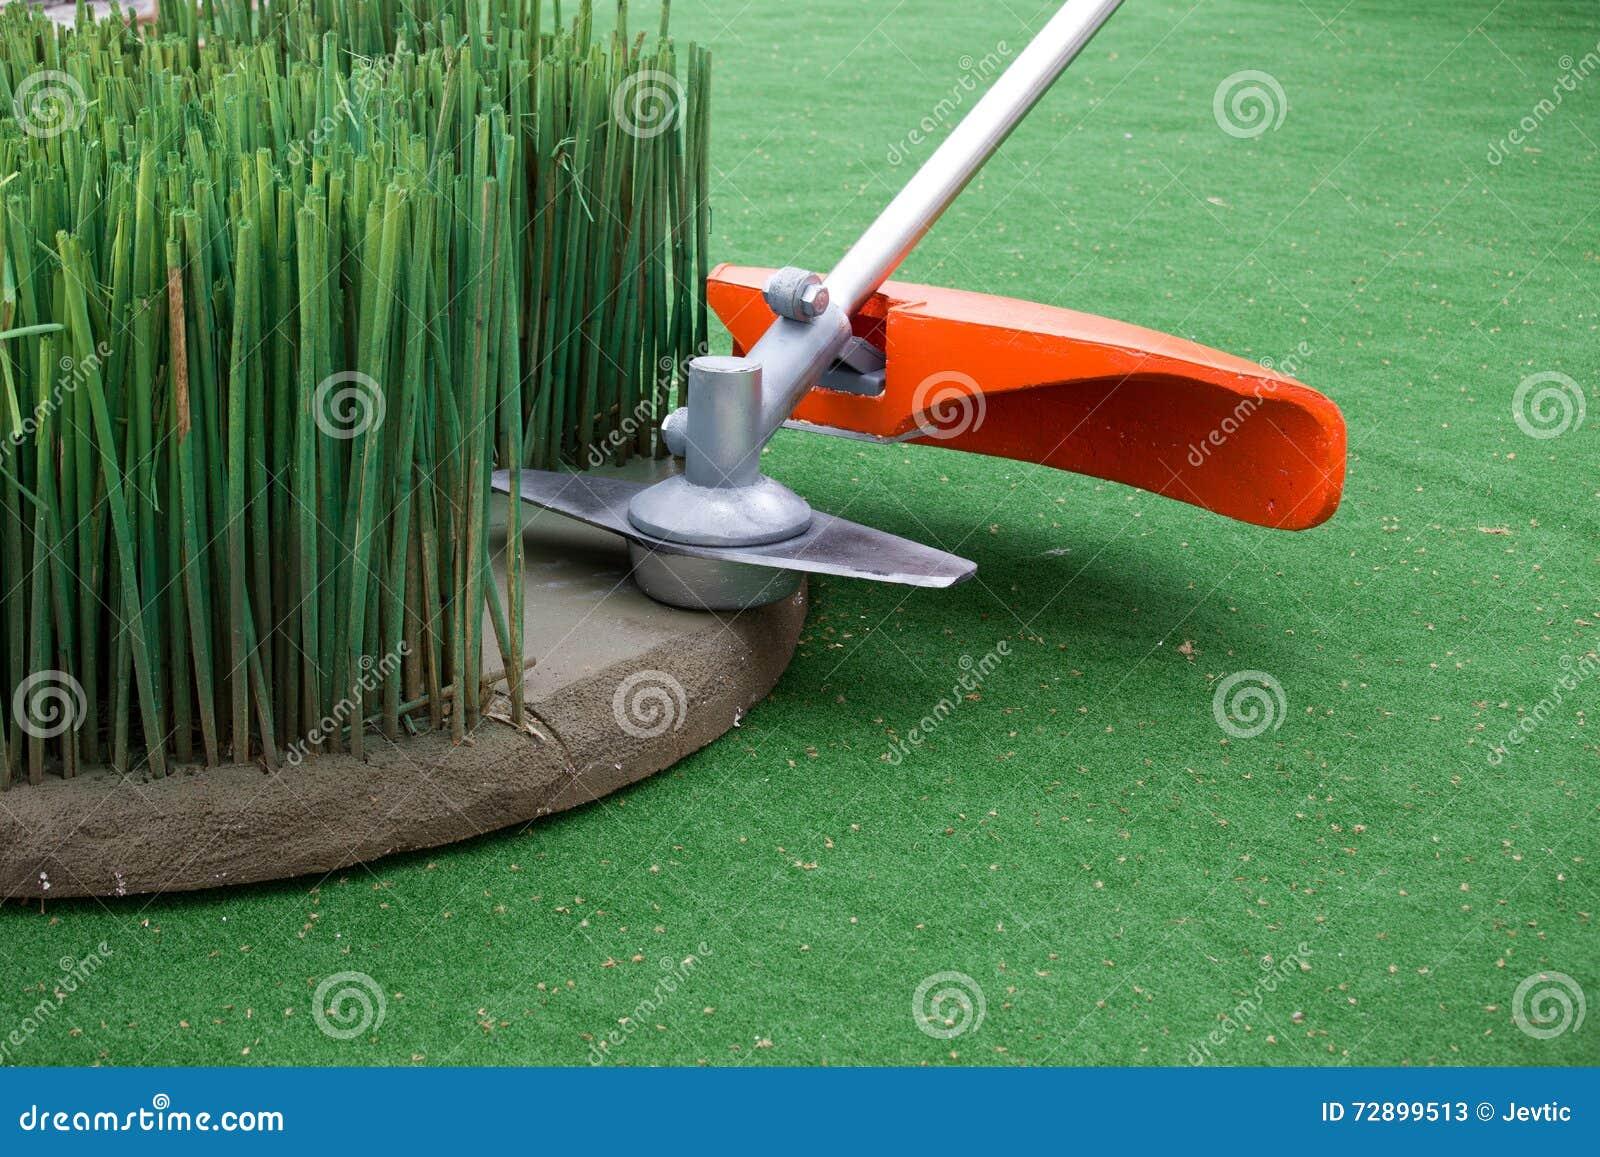 Grass trimmer mowing